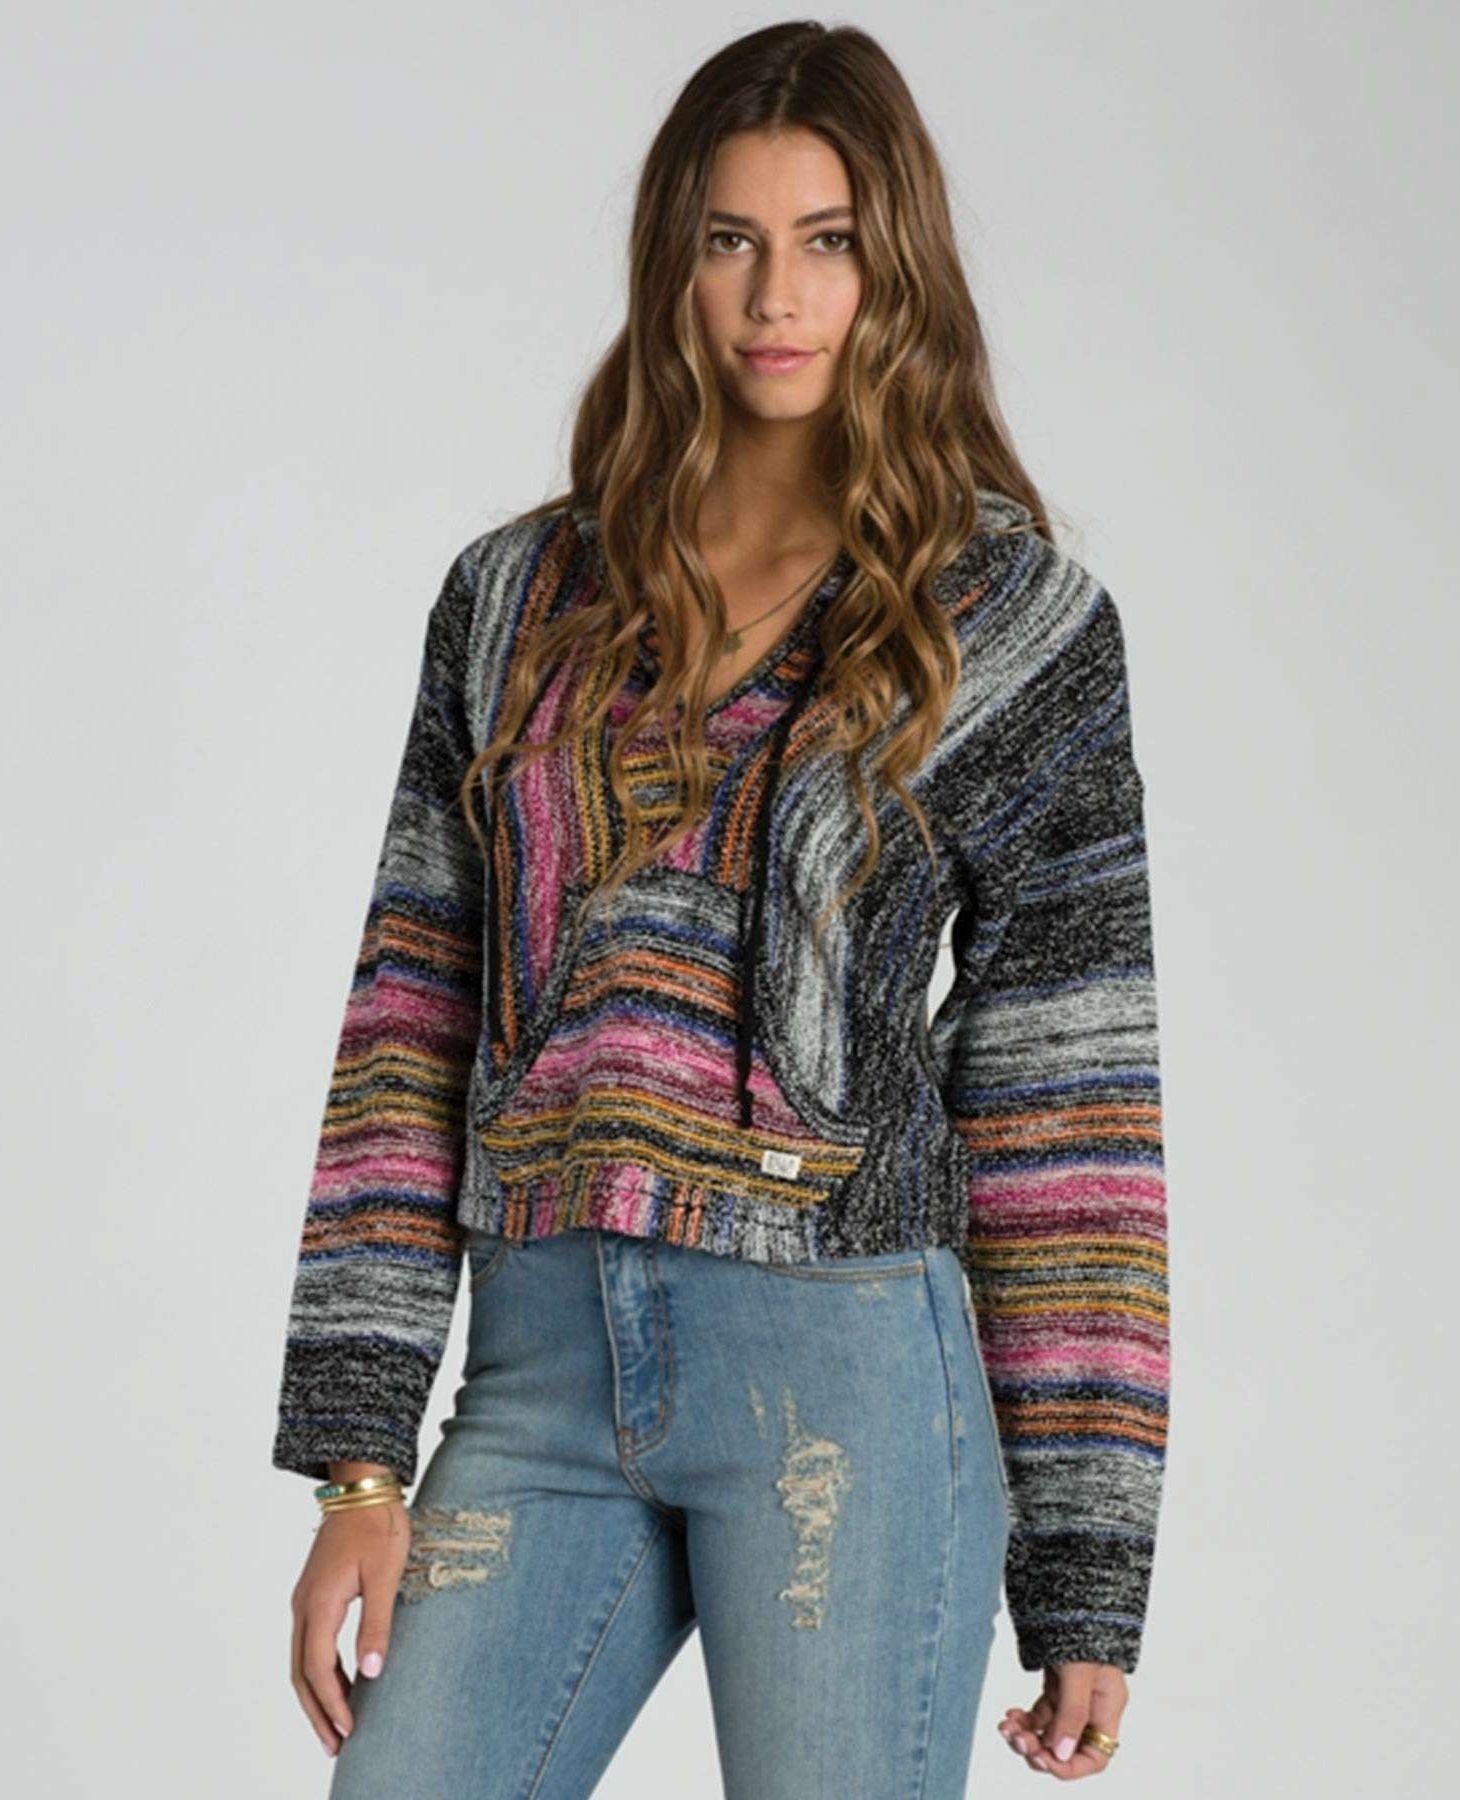 9a7a4c0b2310 Billabong Womens Cropped Baja Sweater